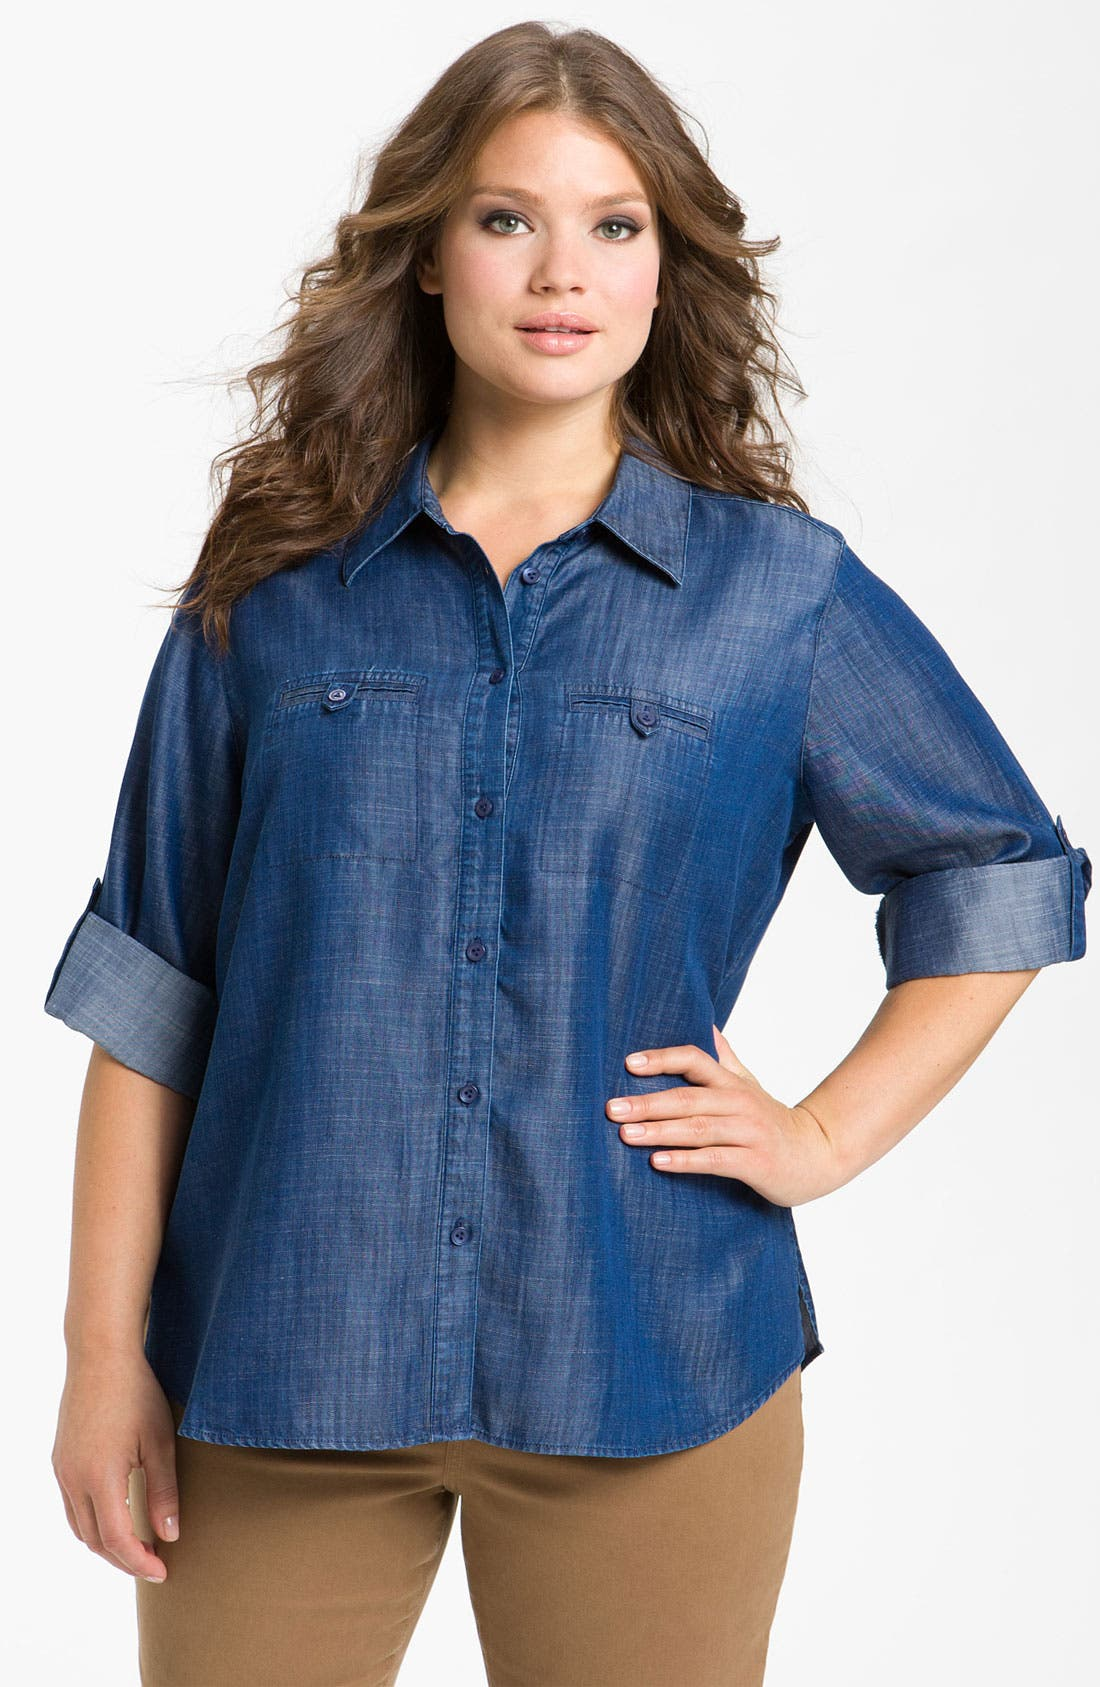 Alternate Image 1 Selected - Foxcroft Roll Sleeve Denim Shirt (Plus Size)